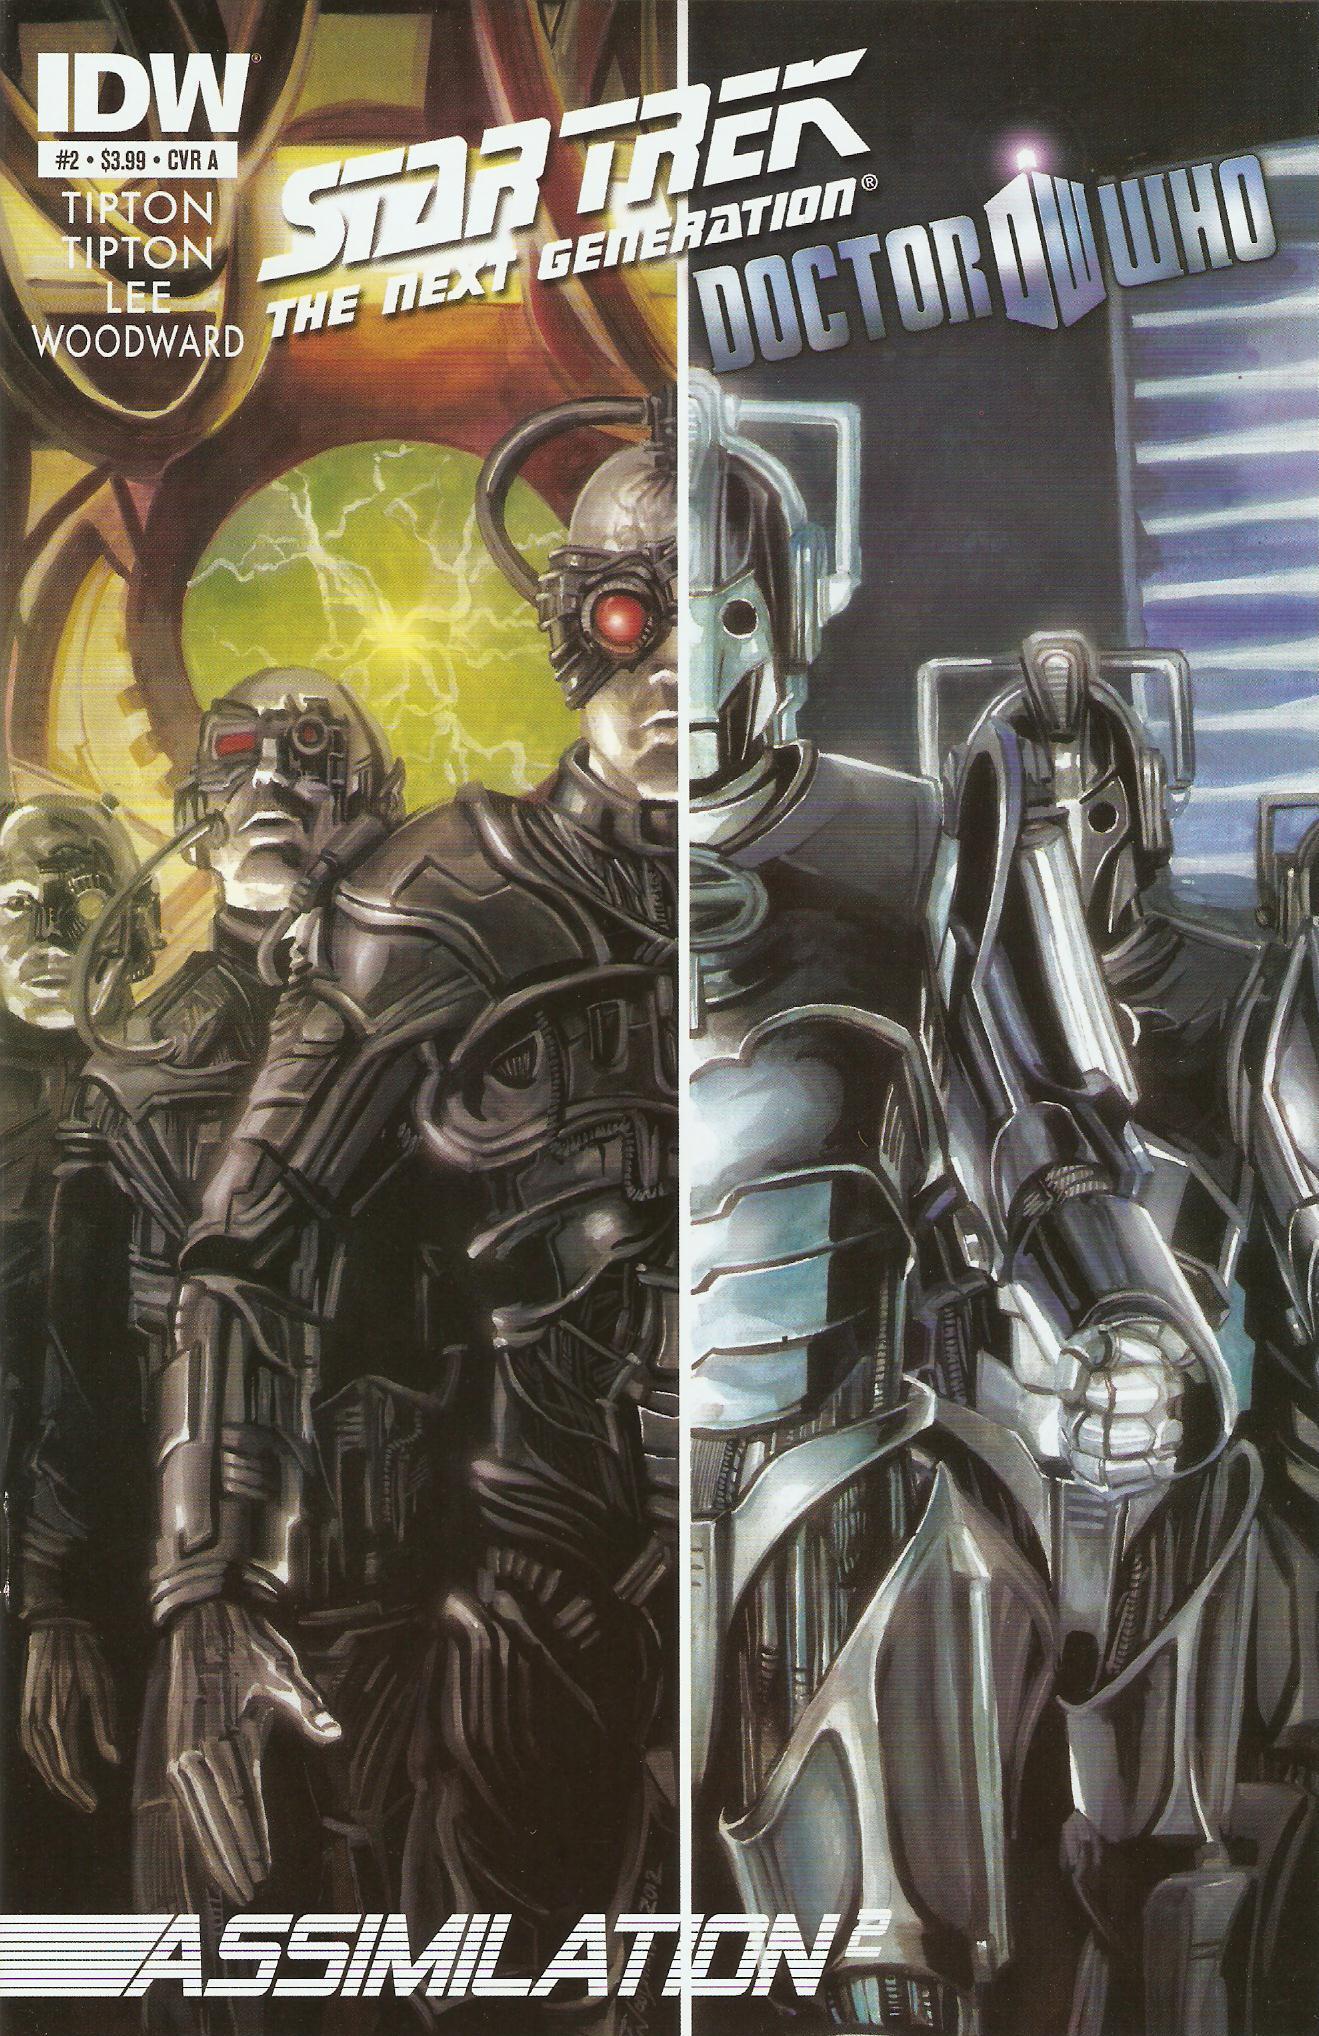 Star trek doctor who 2a